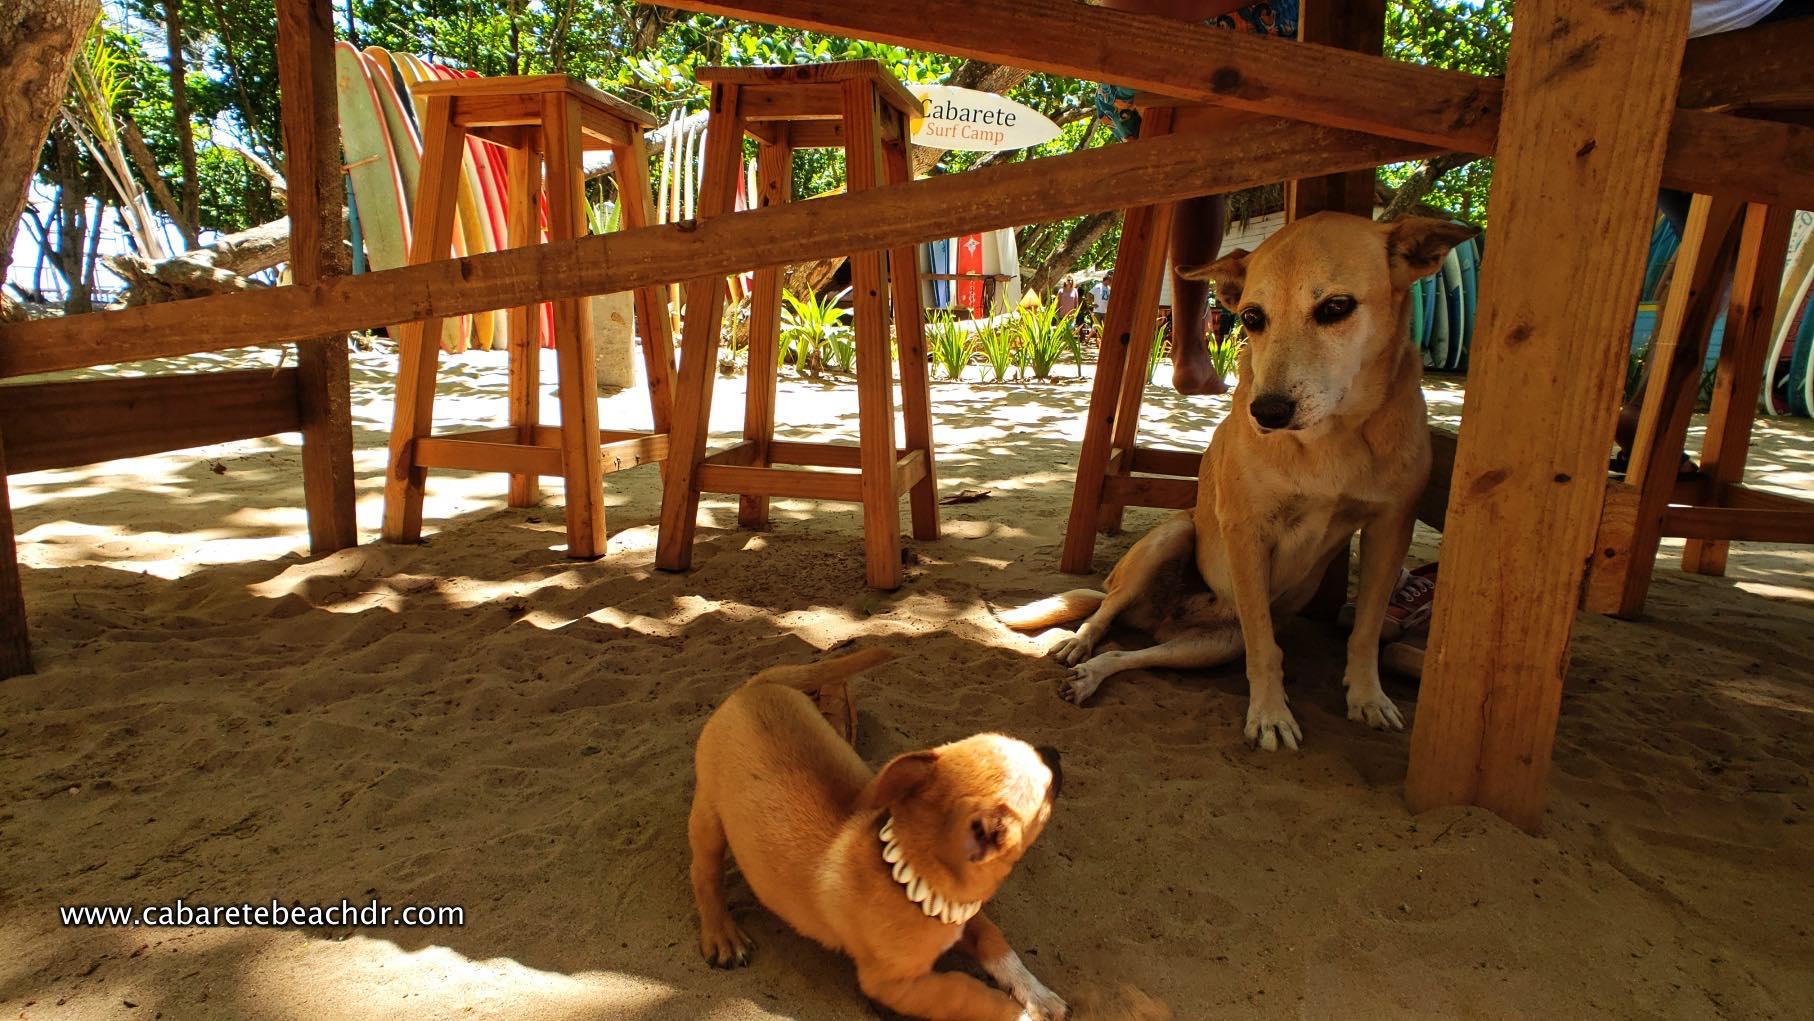 Dogs play in Encuentro Beach, Cabarete